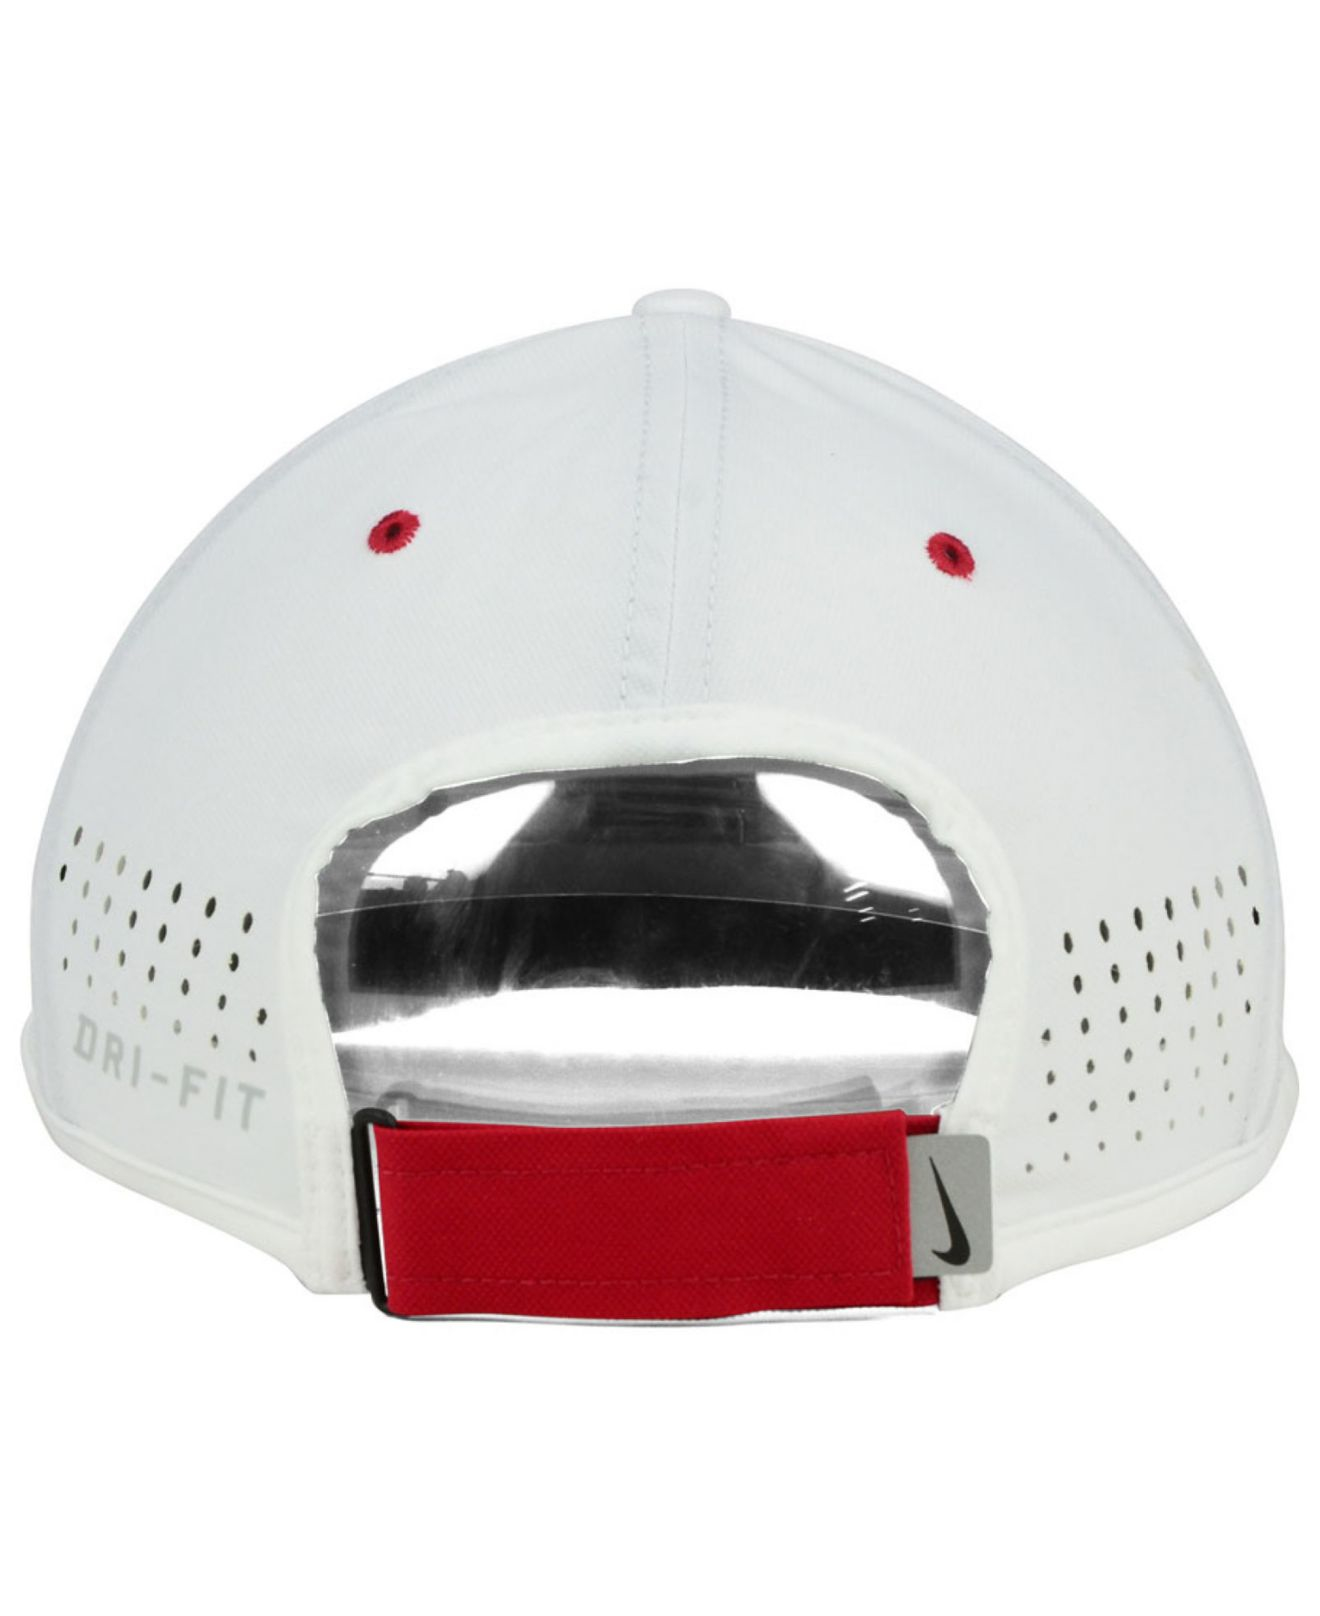 3d4e5e1890641 Nike Usc Trojans Dri-fit Coaches Cap in White for Men - Lyst